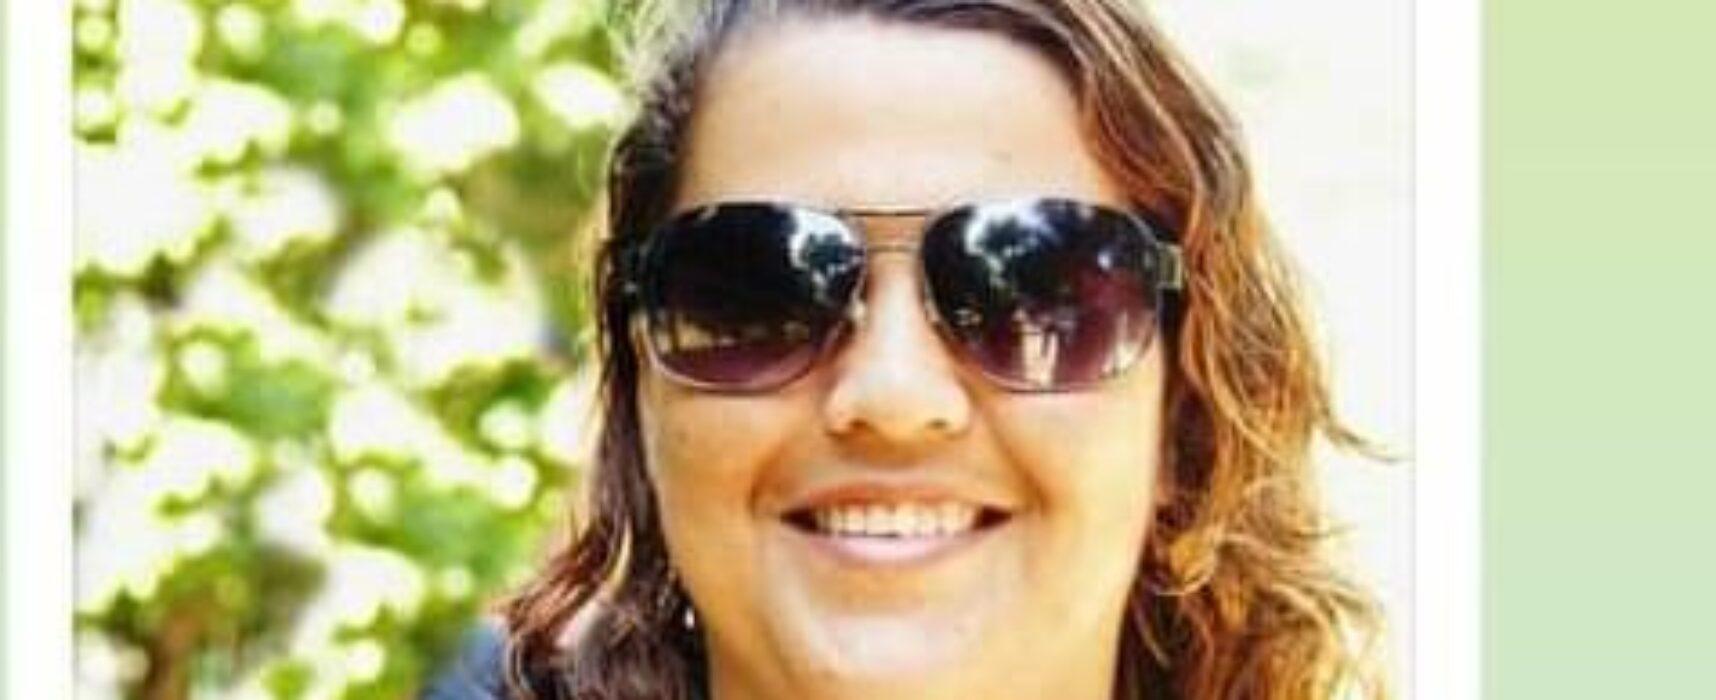 NOTA DE PESAR – RESIDENCIAL VILELA: Patrícia Tainara de Brito